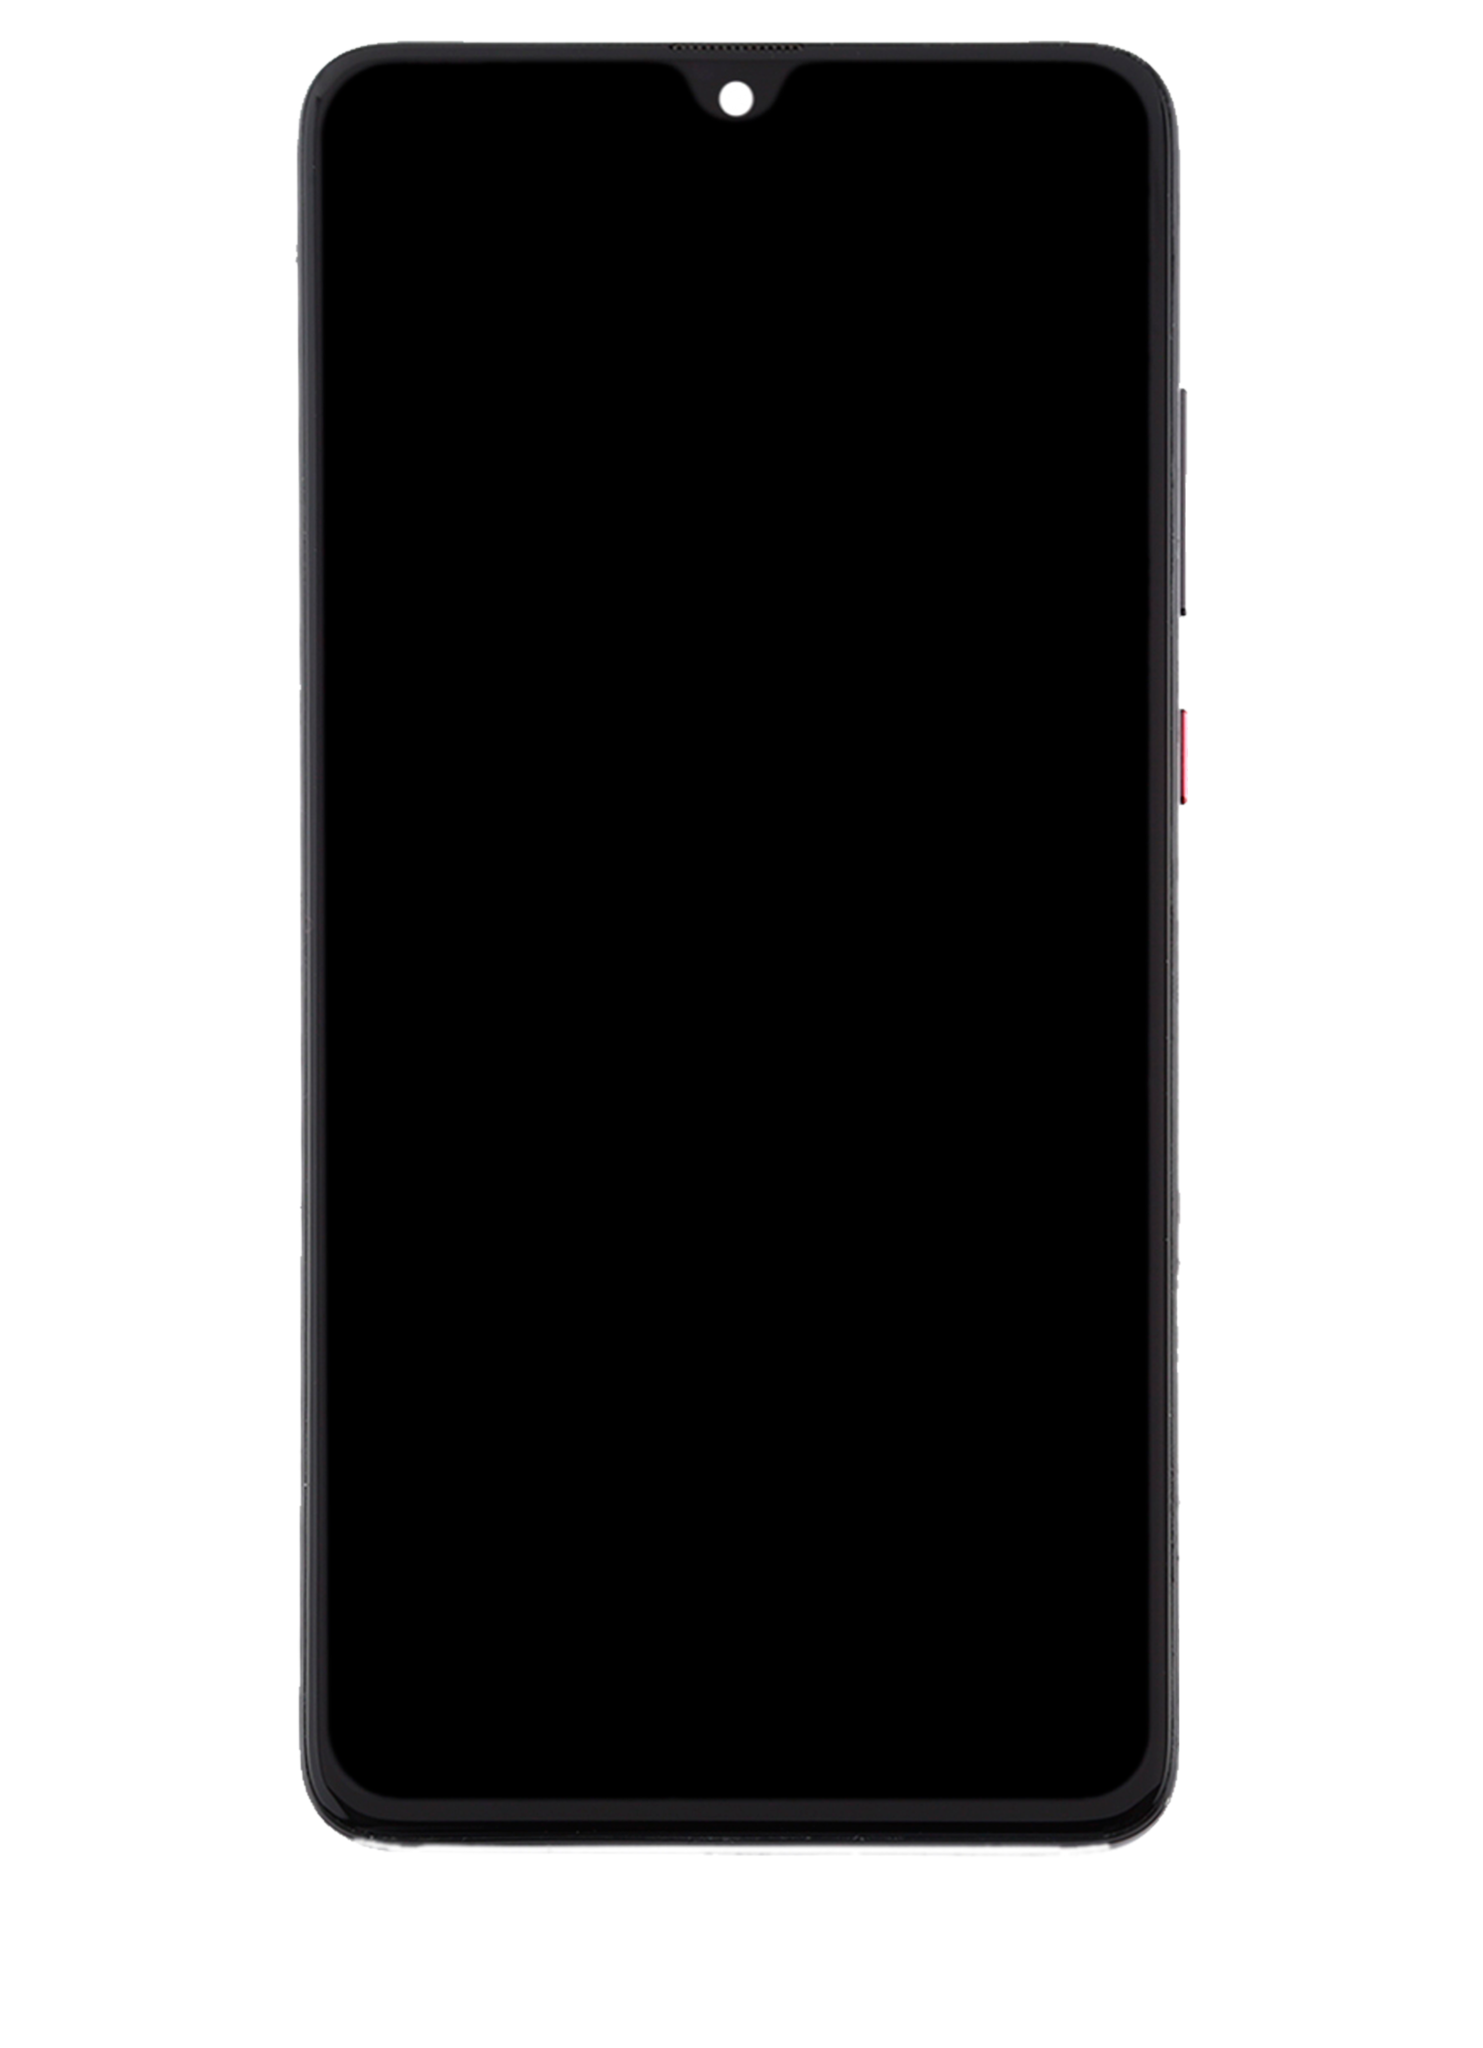 Huawei Mate 20 HMA-L29 Display Module + Frame Black